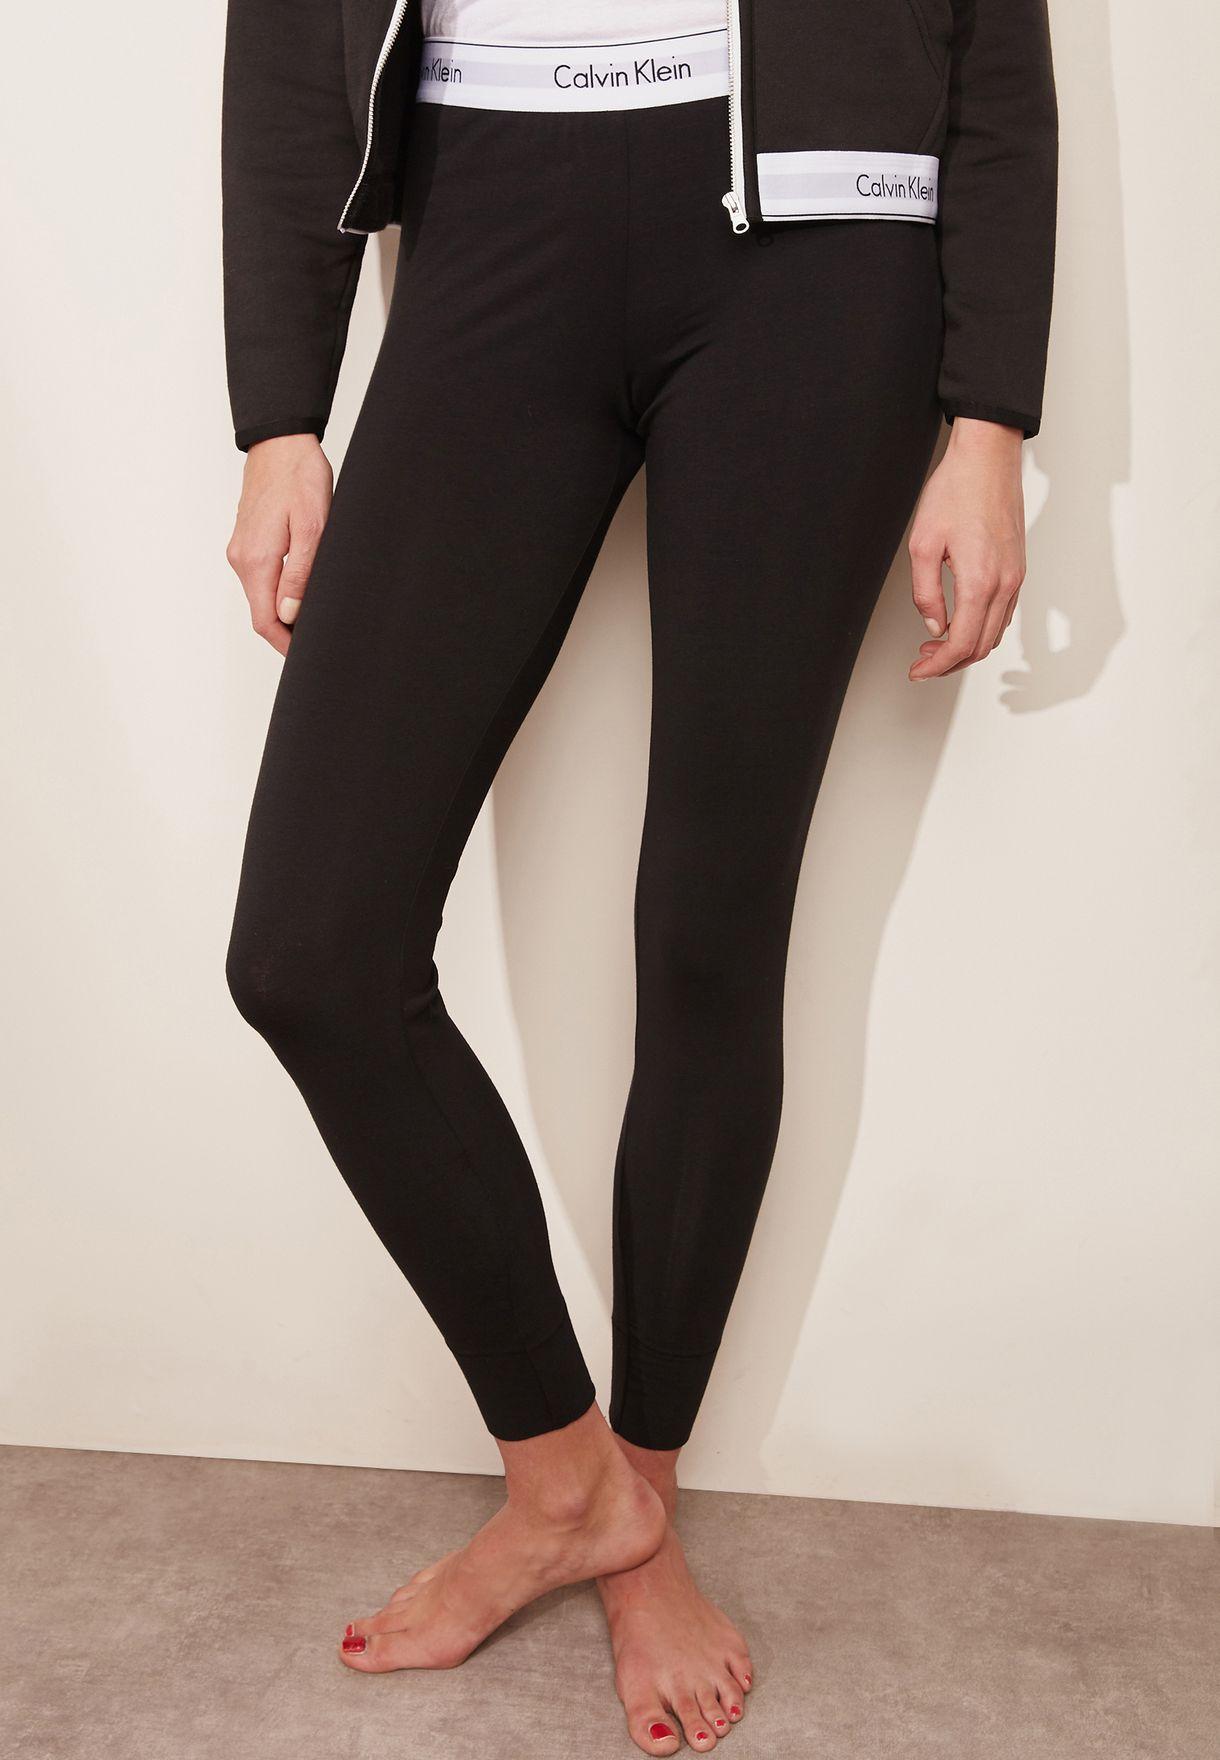 bf29686baaf28 Shop Calvin Klein black Logo Band Leggings 0000D1632E for Women in ...